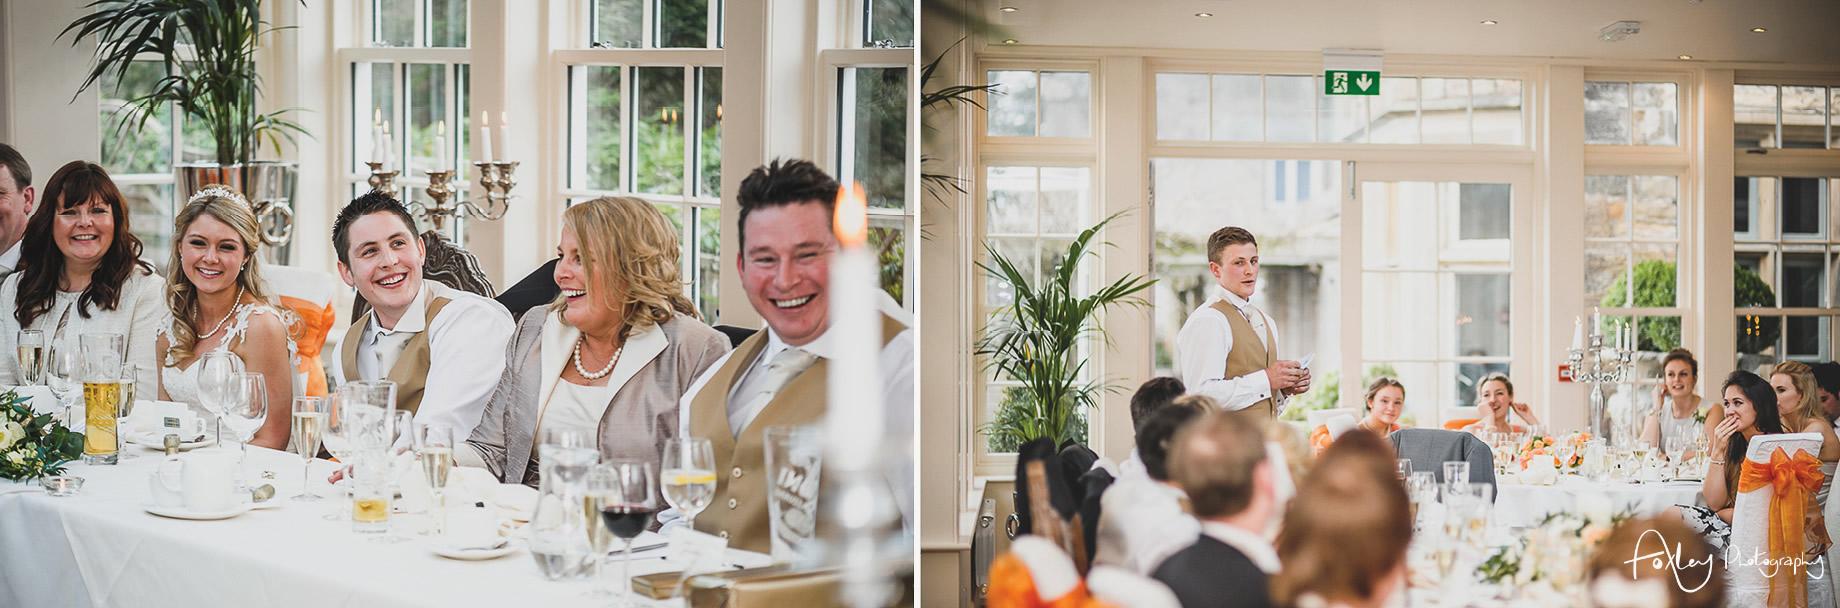 Gemma and Lewis' Wedding at Mitton Hall 134